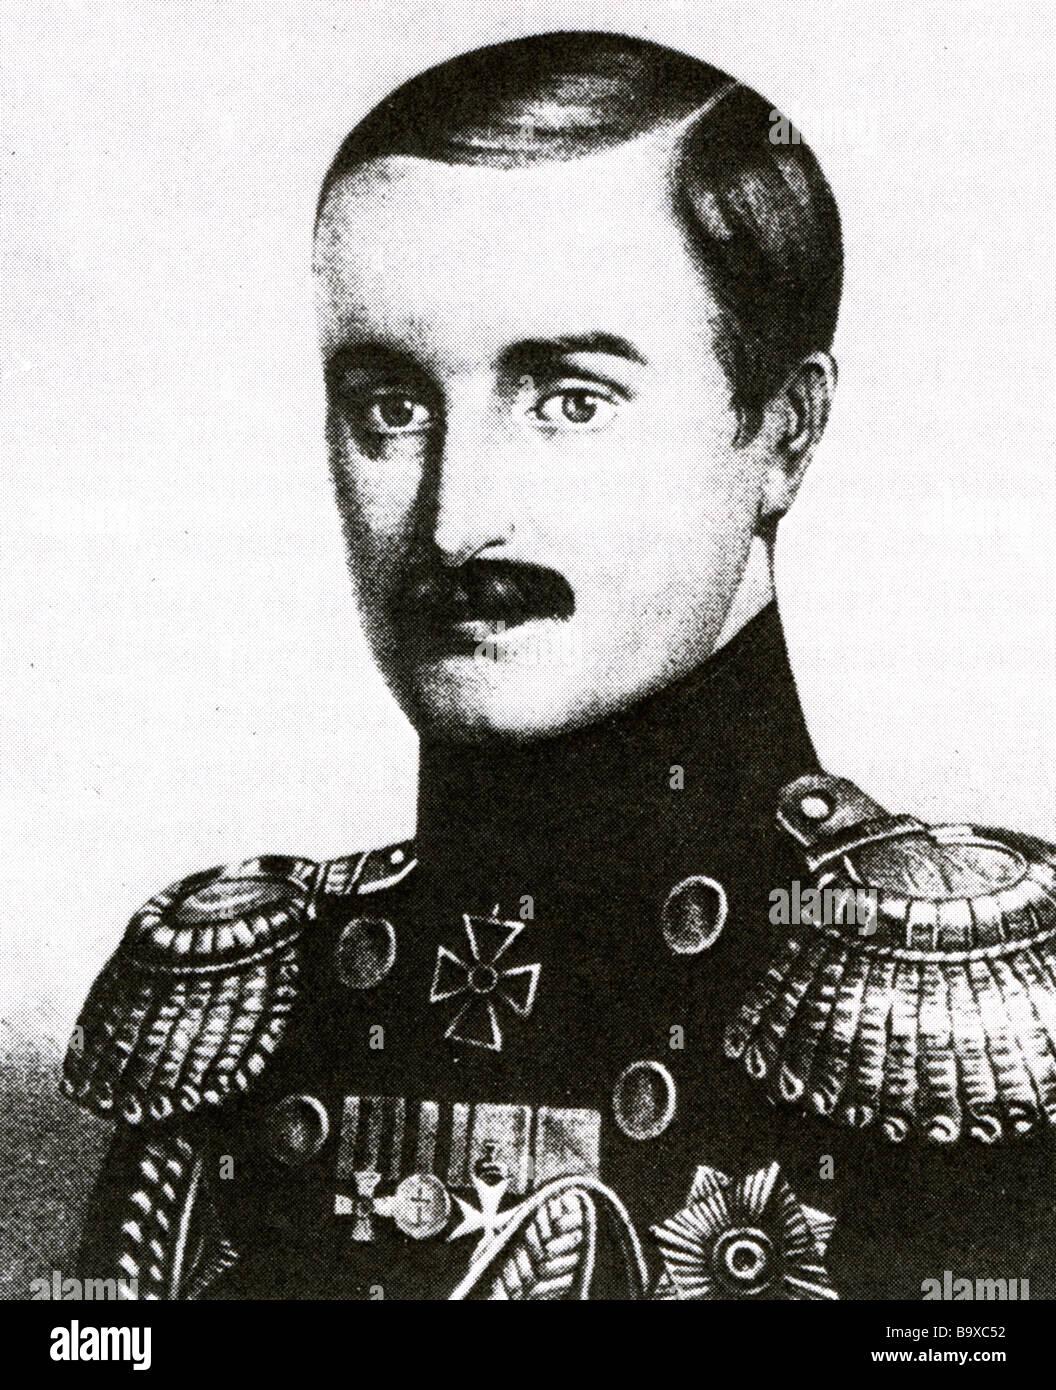 LAVRENTI KORNILOV Russian Army general 1870 to 1918 - Stock Image